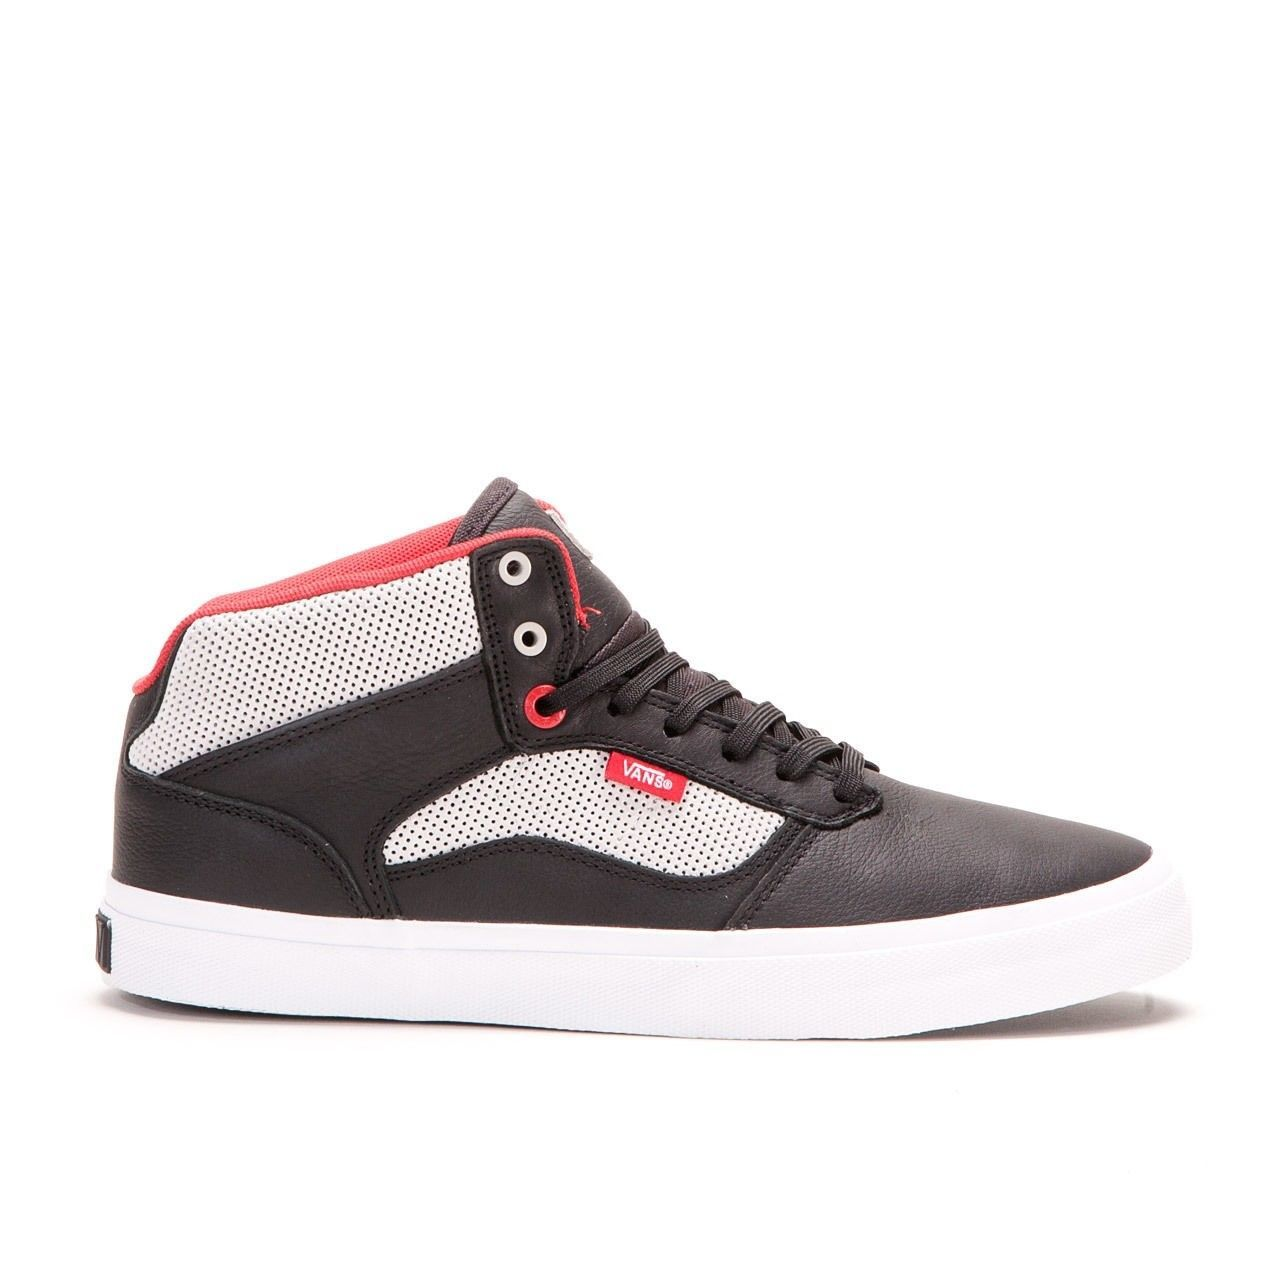 Vans Bedford (LS) Black/Moon OTW Skate Shoes MEN'S 6.5 WOMEN'S 8